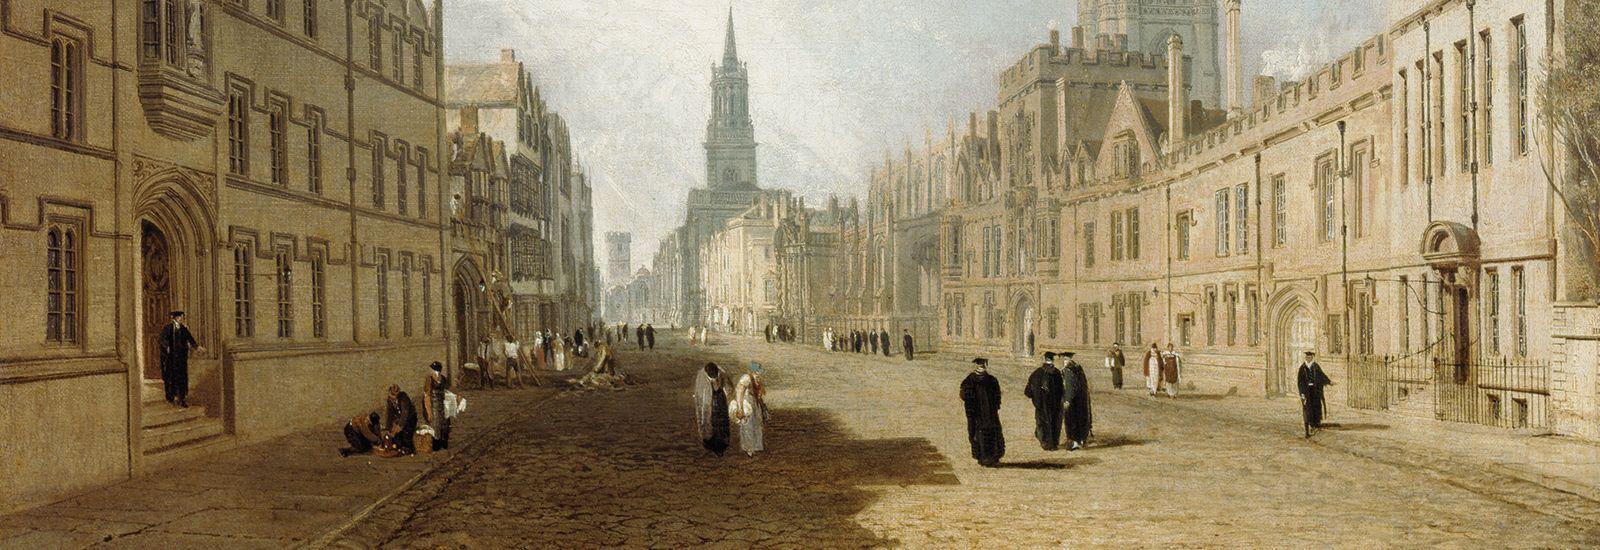 JMW Turner's 'The High Street, Oxford' (1810)